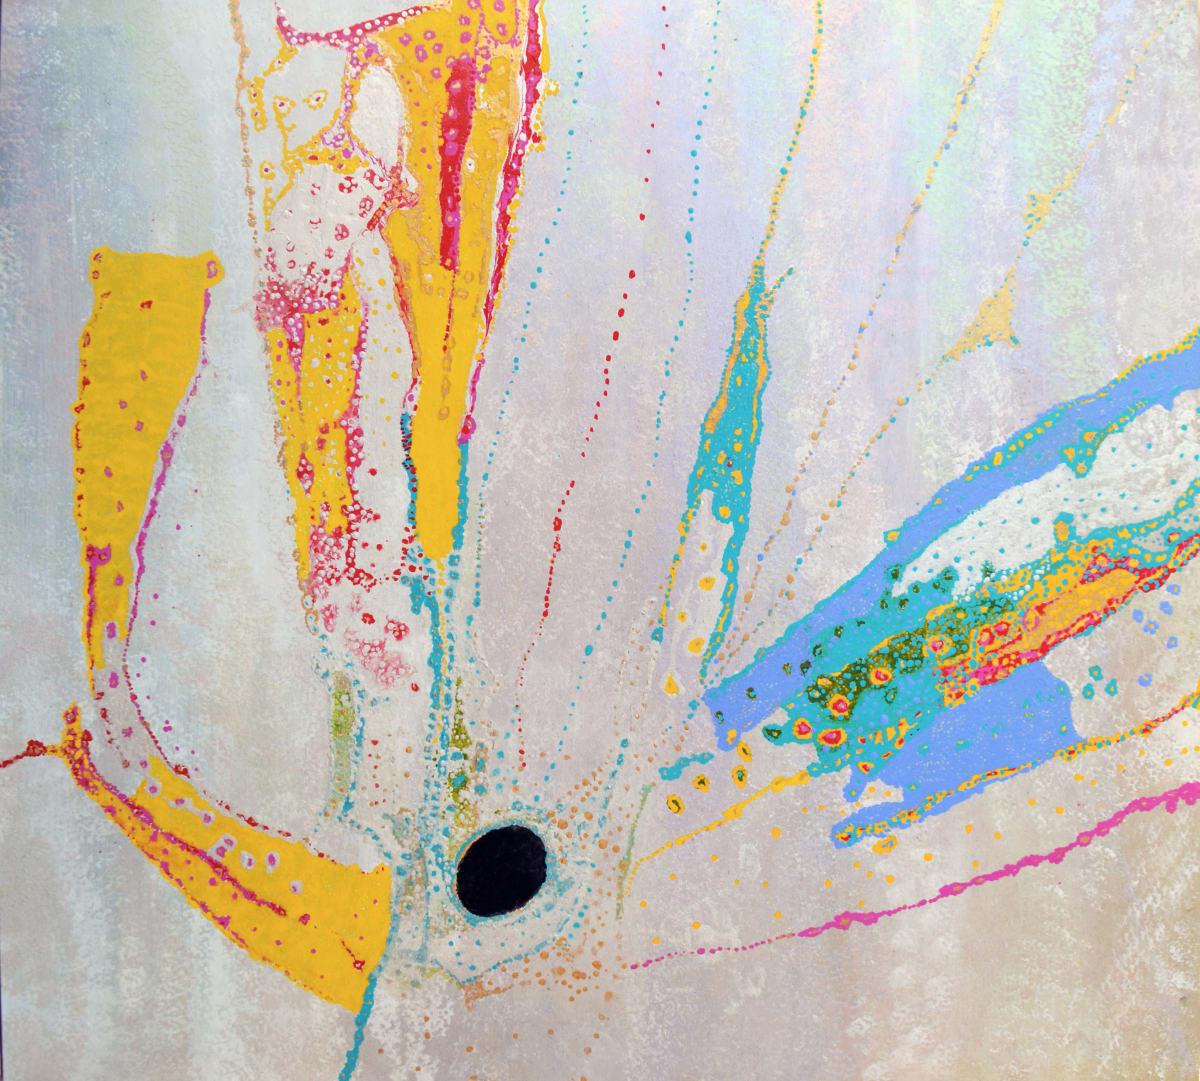 Daniel Walbidi + Matthew Johnson Wonga (Conversation) acrylic on plywood 90 x 100 cm